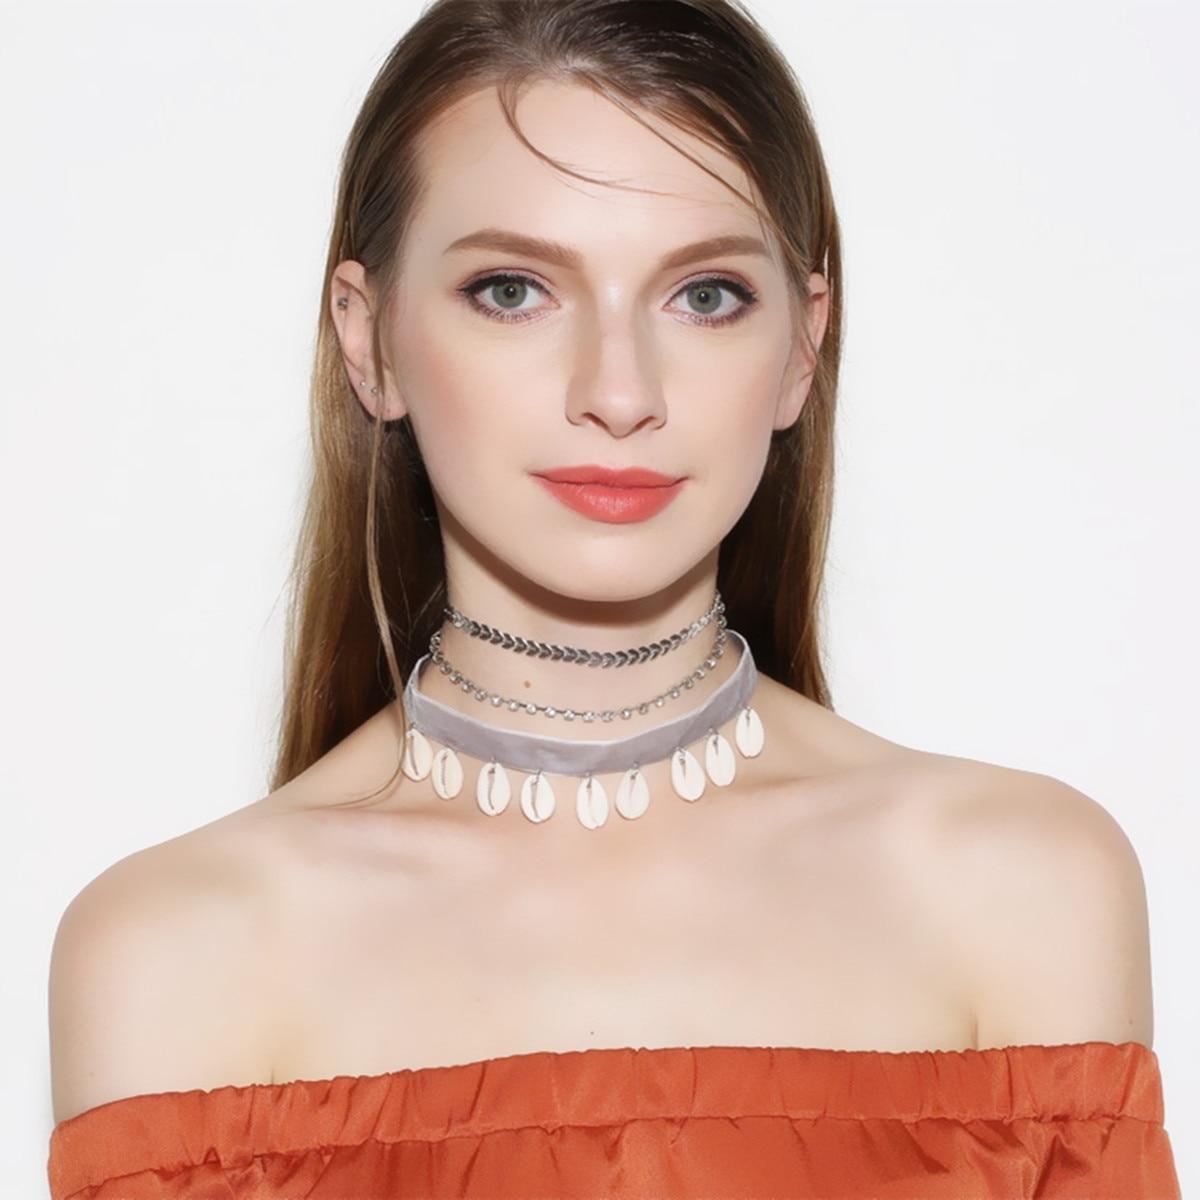 Beach Shell Velvet Necklace Multi Chain pendant for Women silveer gold chain Chocker Conch Necklaces